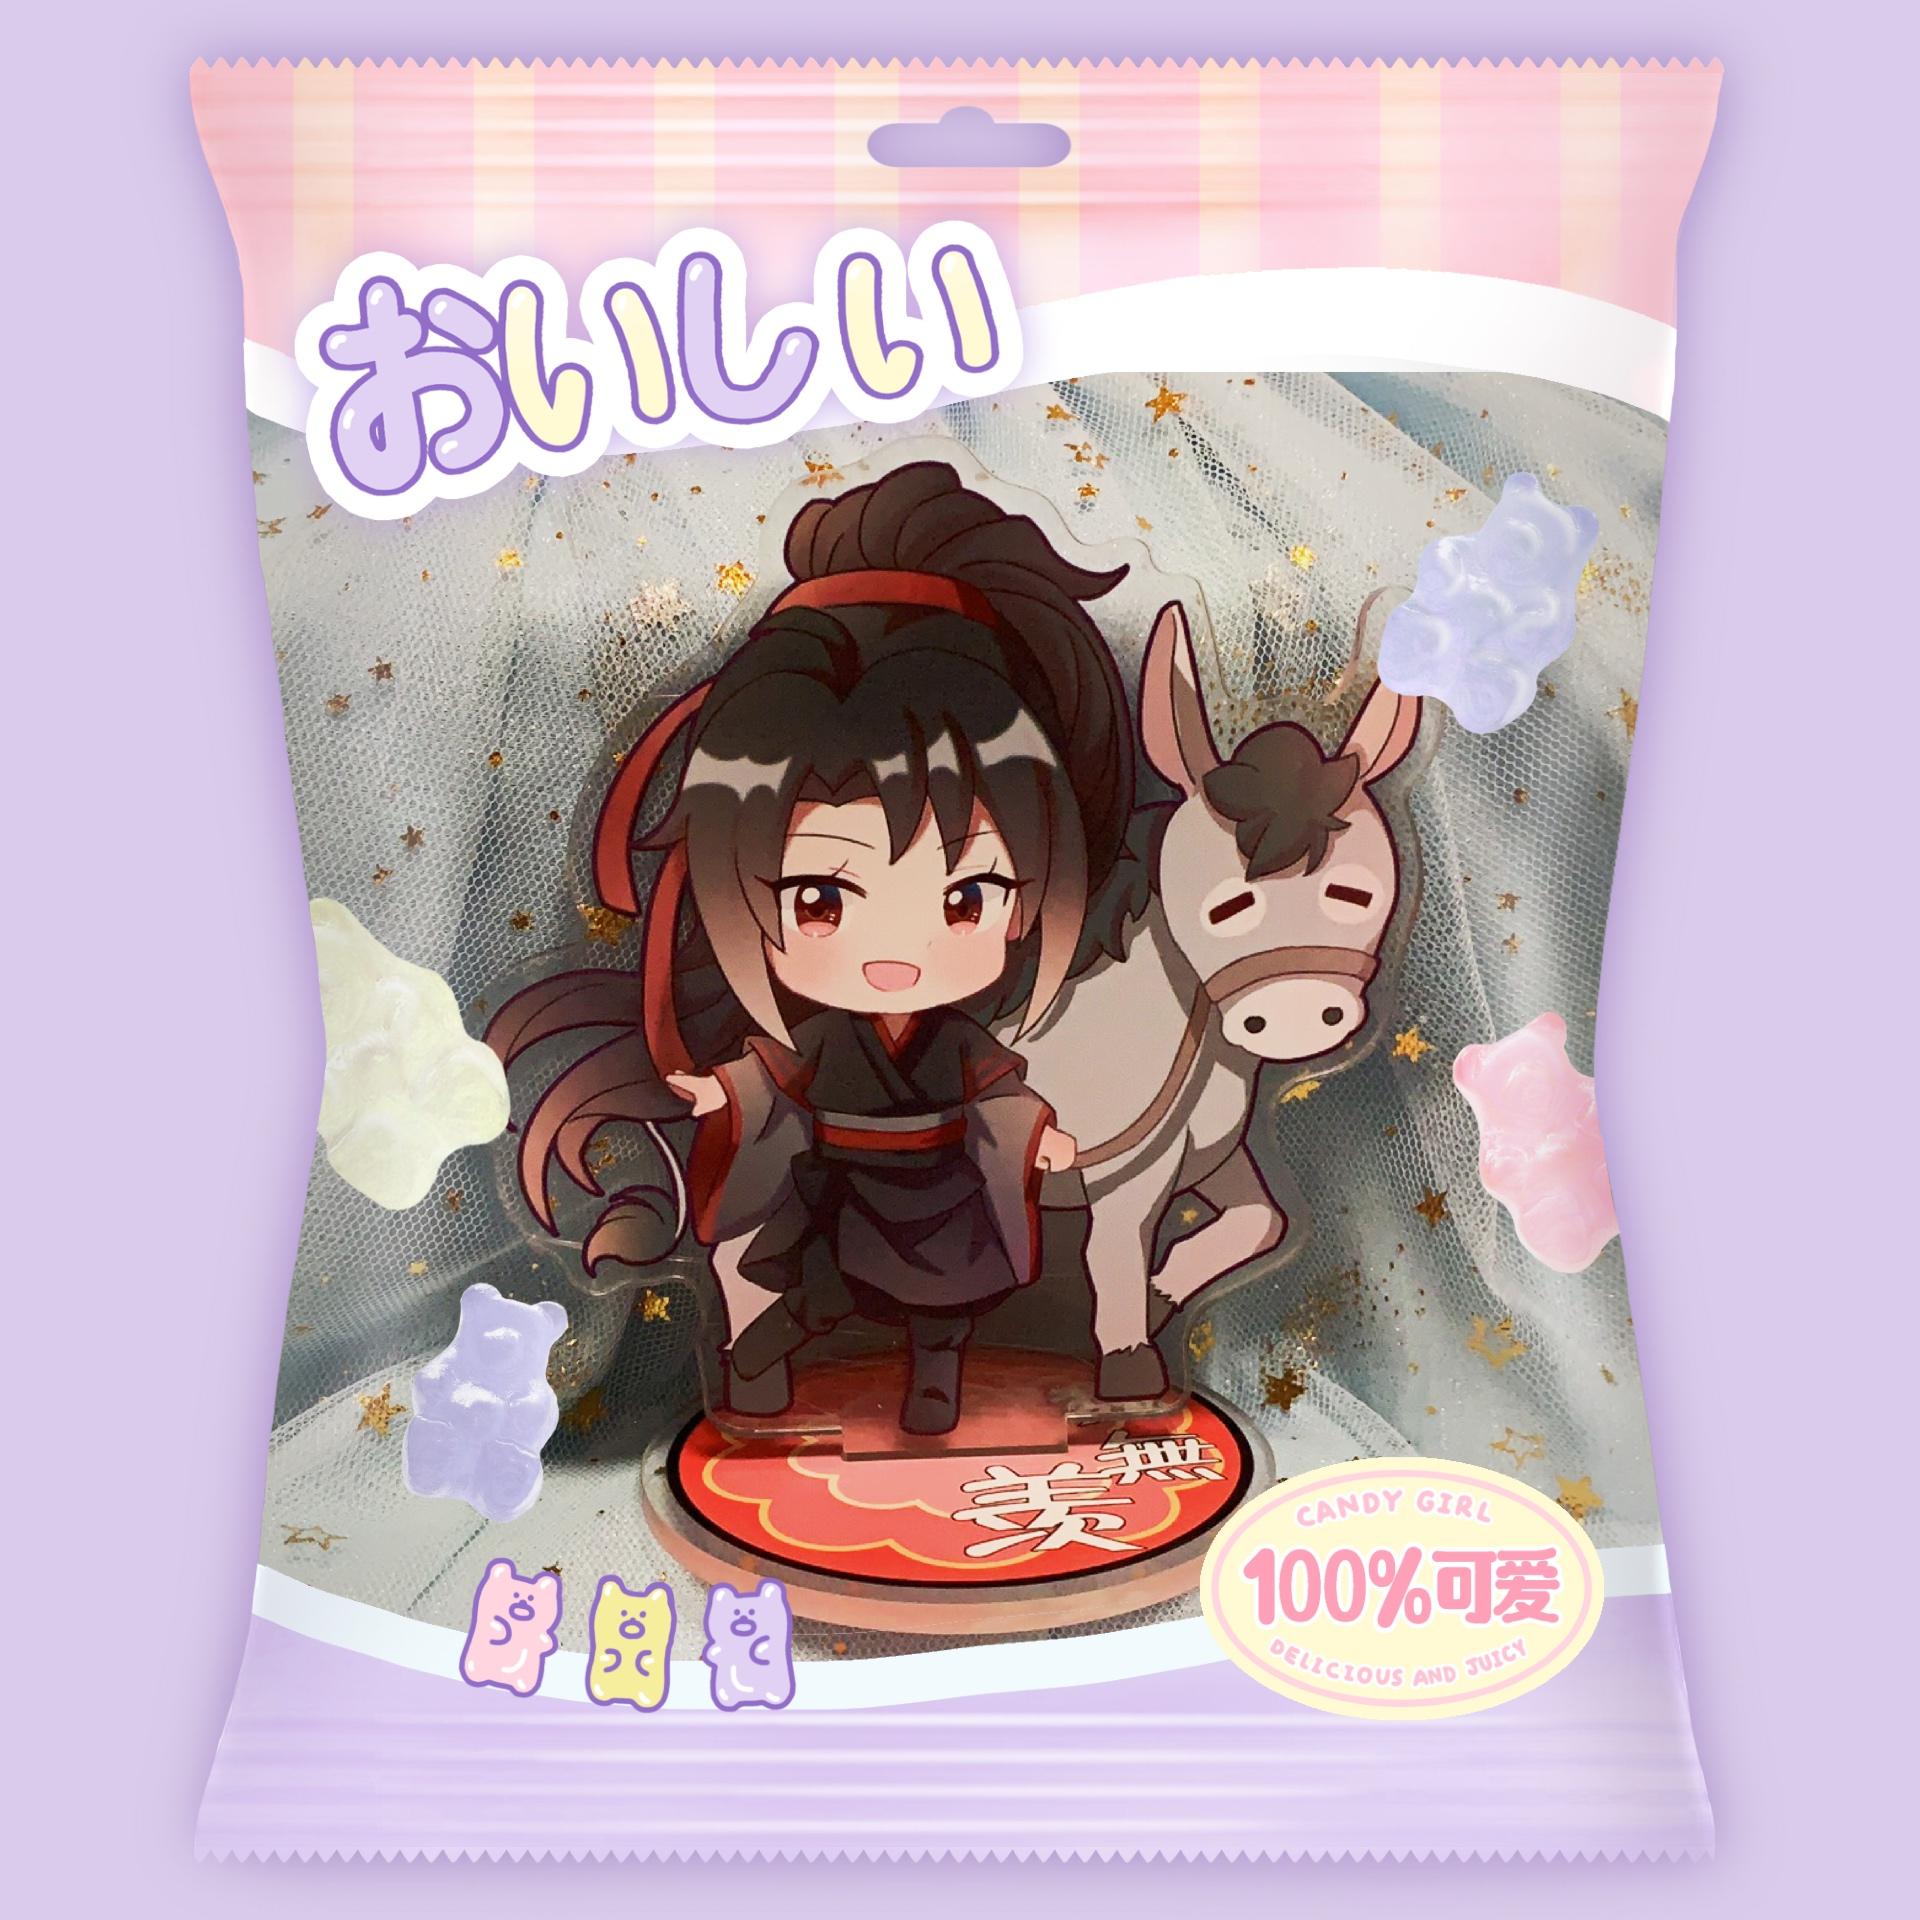 [Diyuan grocery store] yakili brand of pet paradise